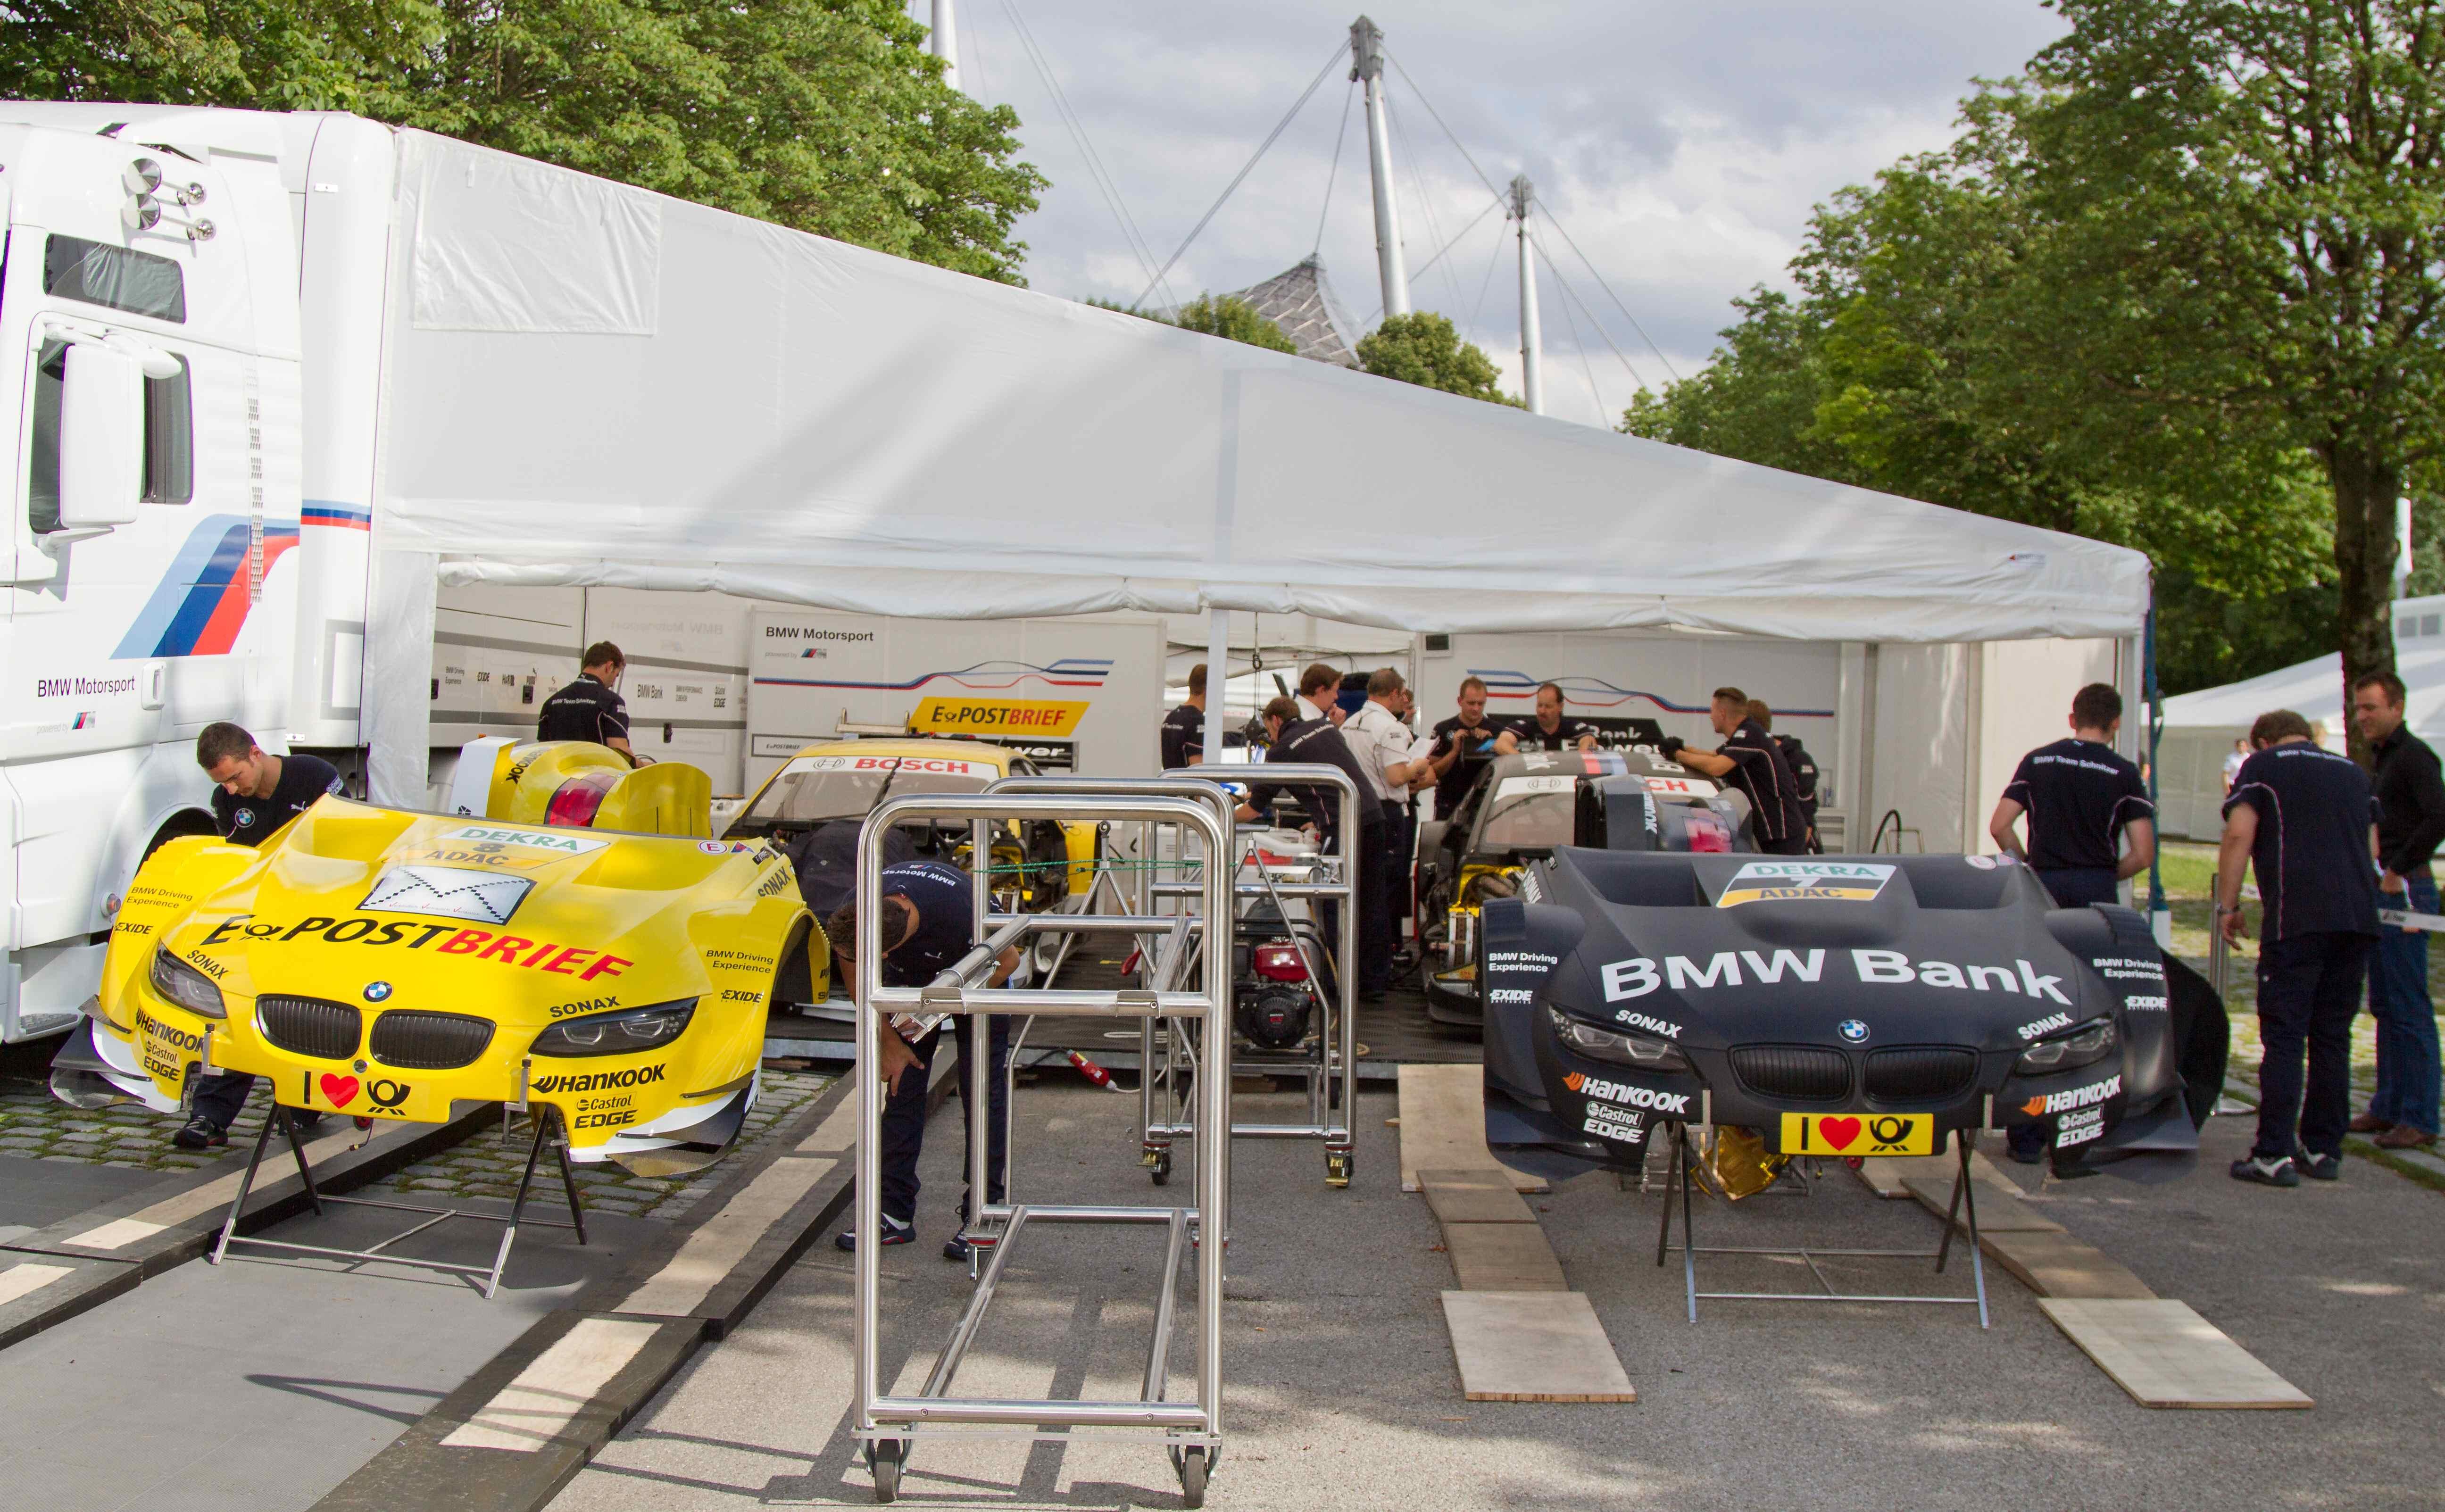 Il pilotalucchese, con la Renault mit dem bet-at-home voucher code richtig geld sparen Twingo R2 della sua nuova squadra ...